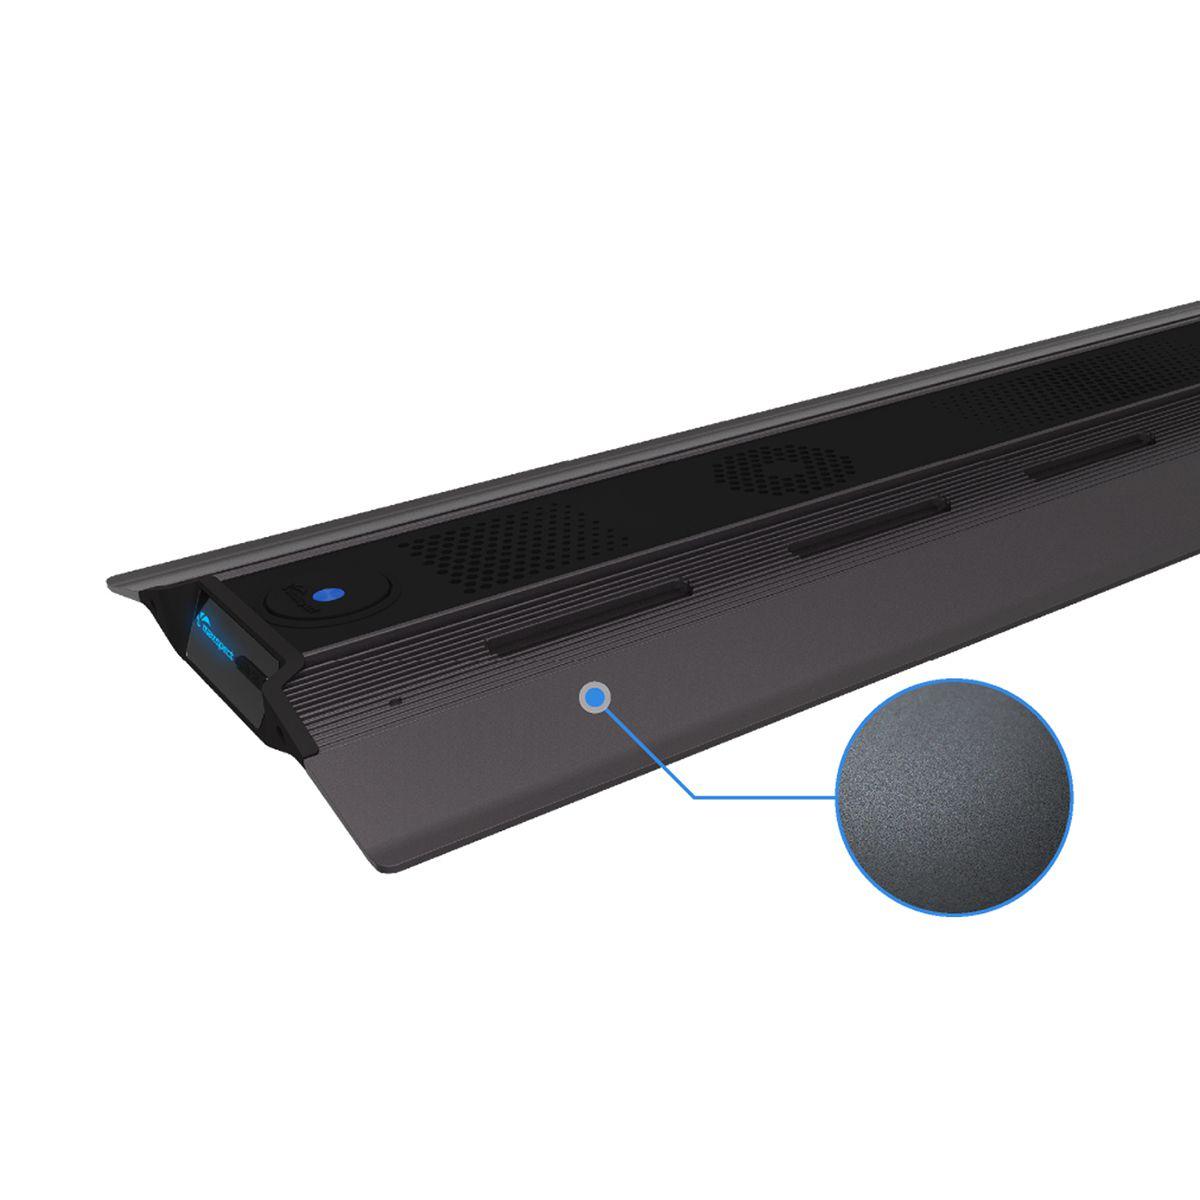 Luminaria LED Maxspect Rsx F50 50w p/ Plantados 35 a 55cm